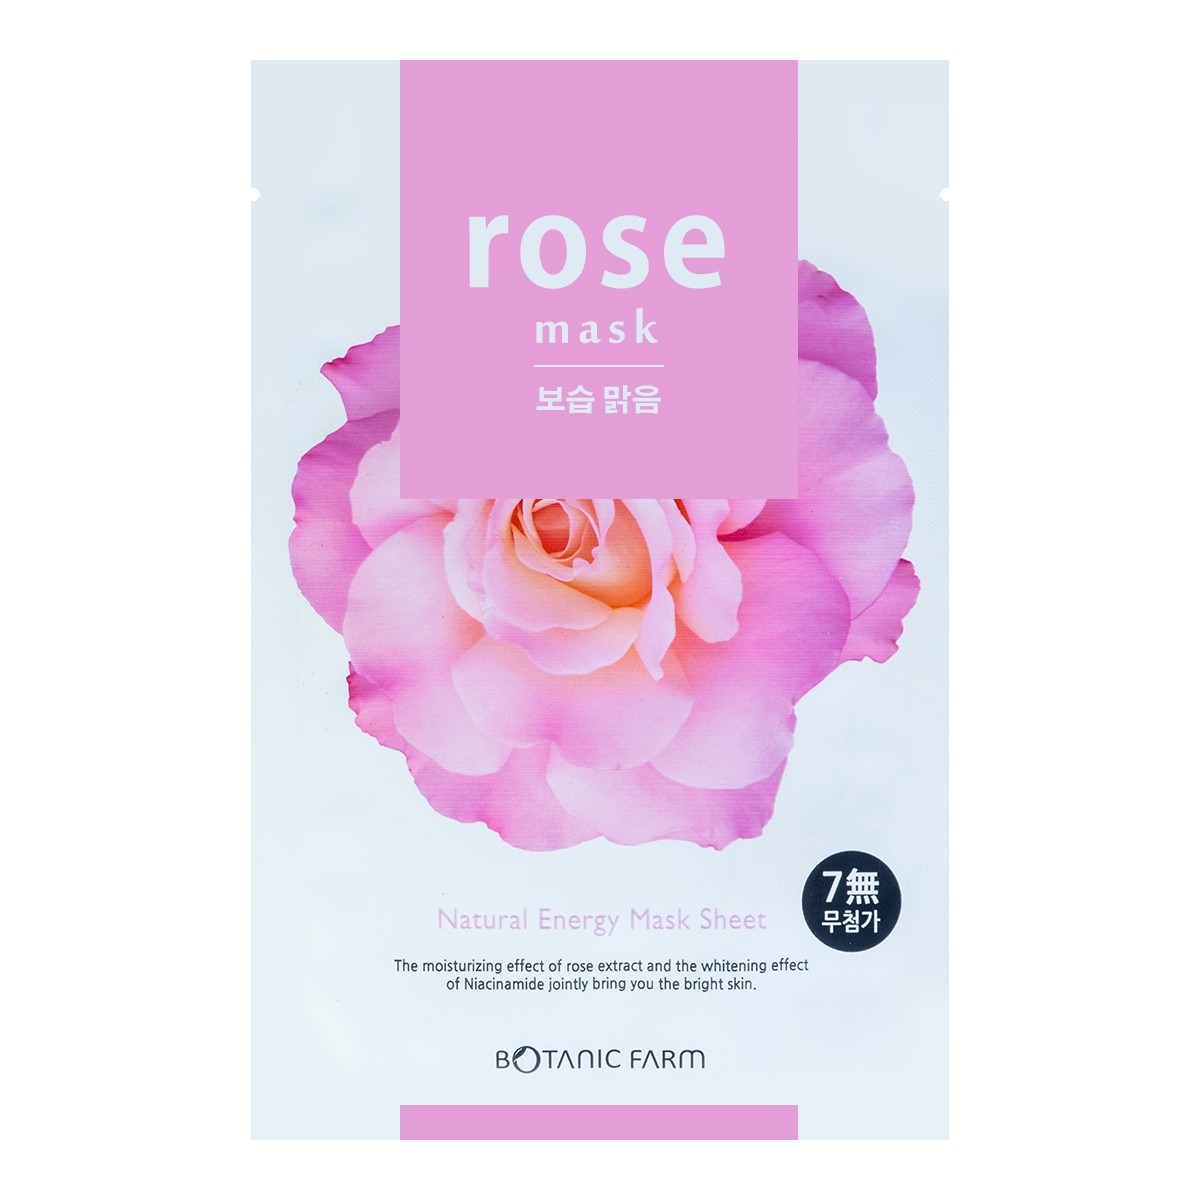 BOTANIC FARM Natural Energy Mask Sheet Rose Mask 1sheet